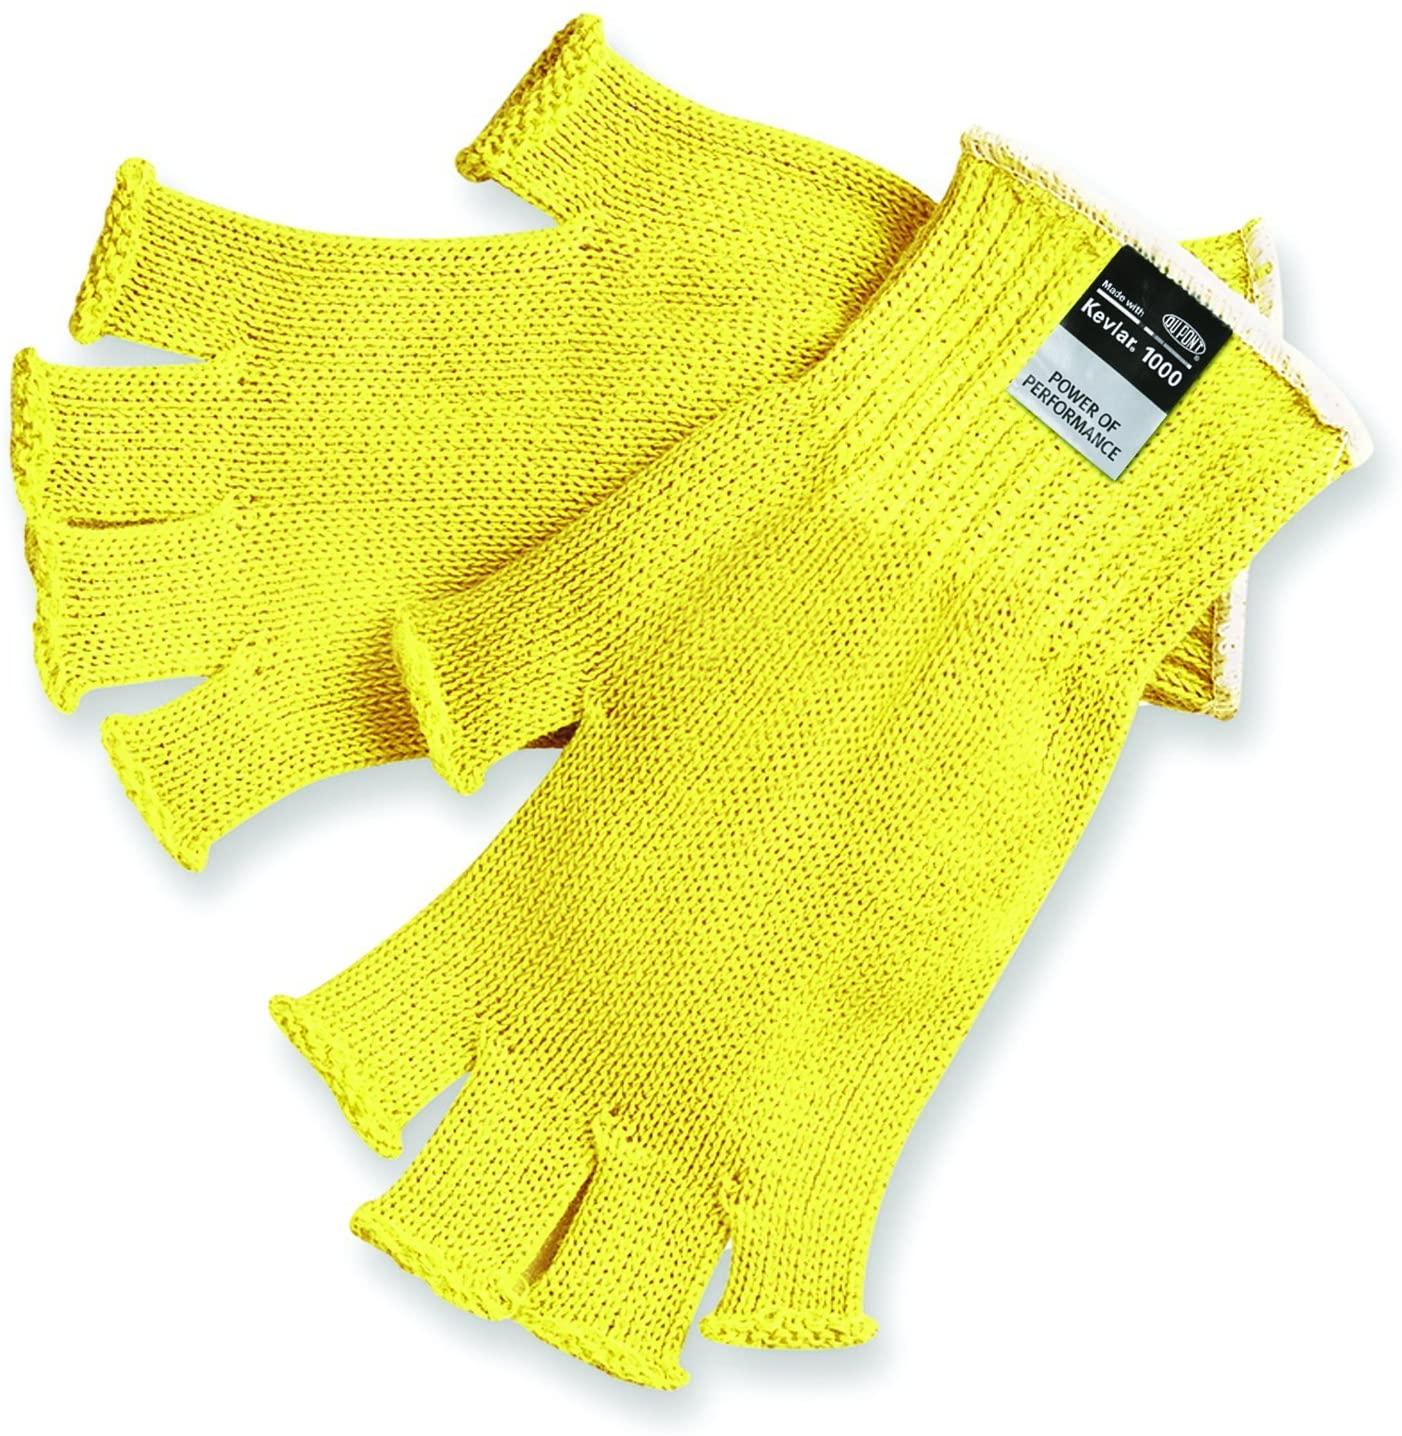 MCR Safety 9373XL Kevlar Regular Weight 7 Gauge Fingerless Gloves, Yellow, X-Large, 1-Pair